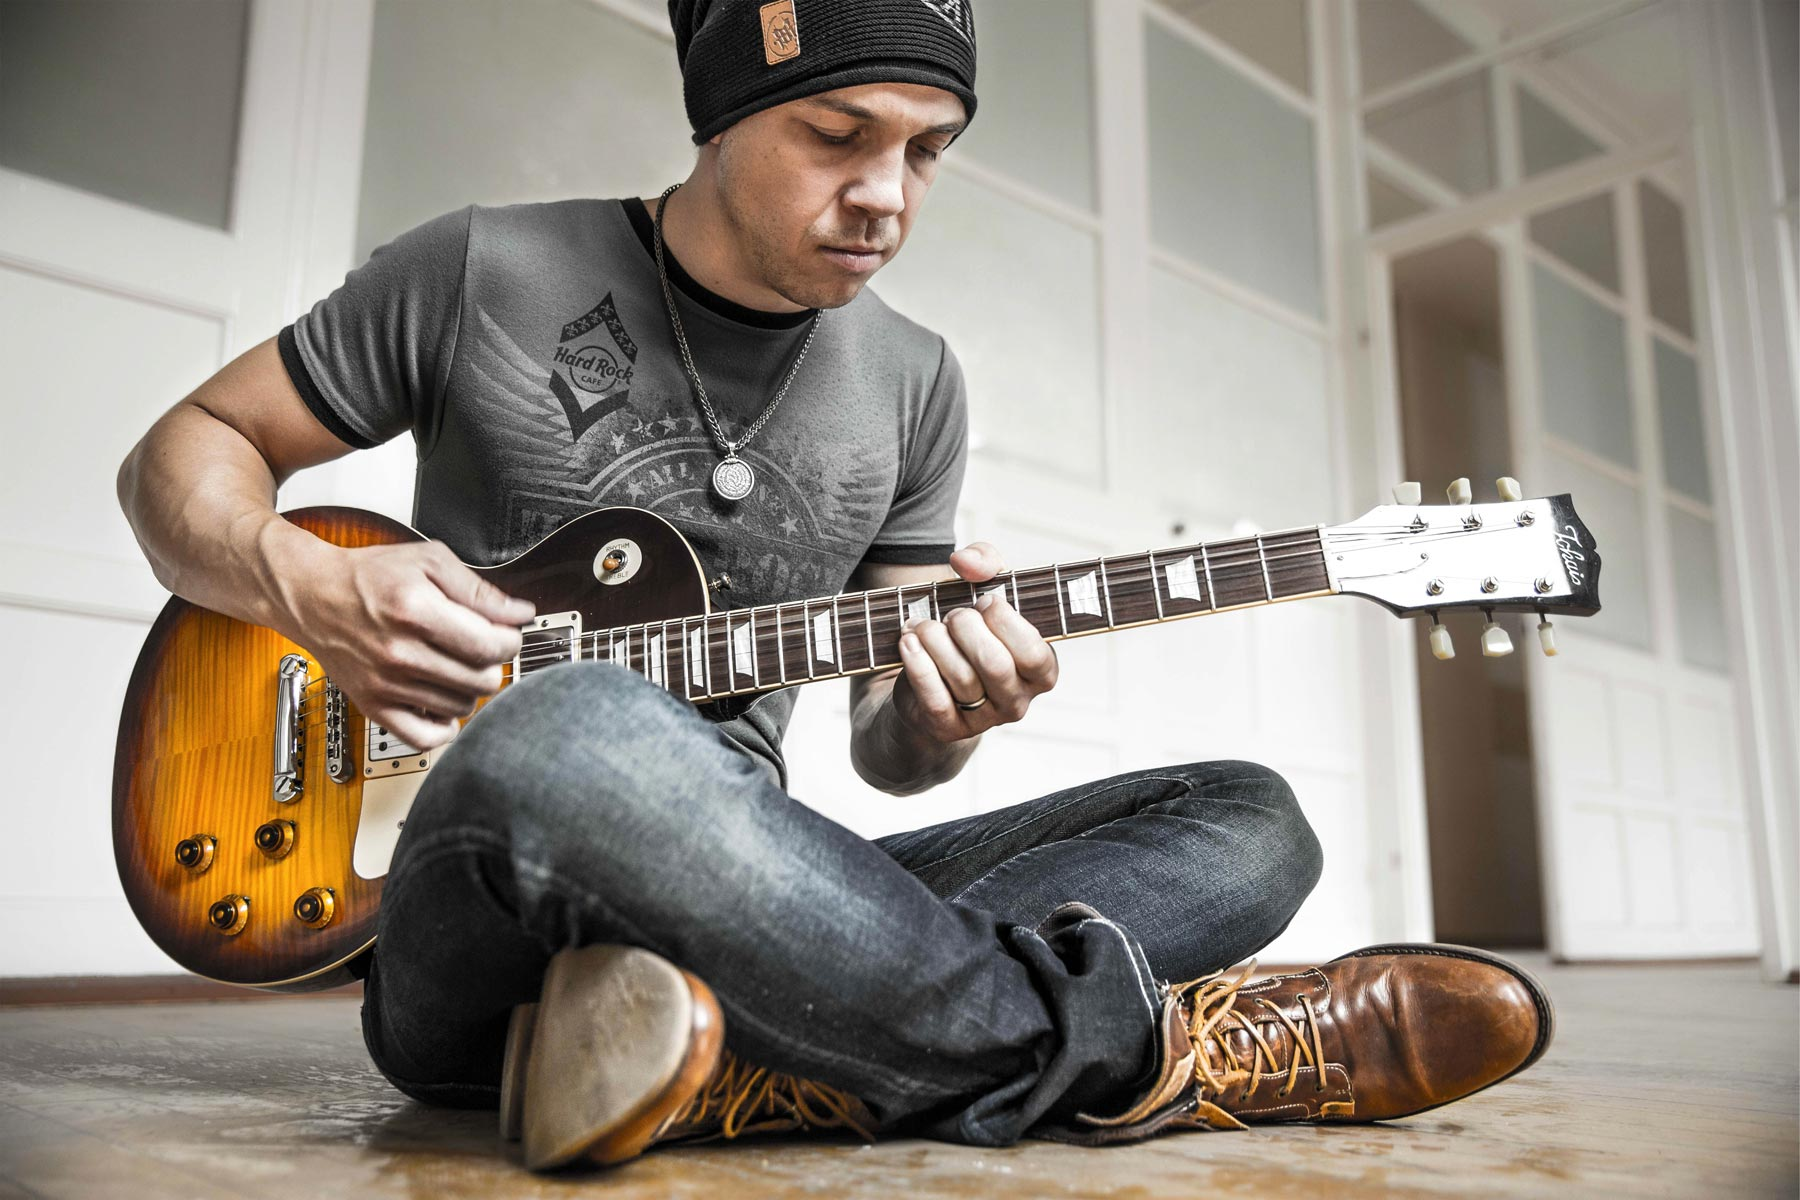 Music Label Calygram - Artist - Wiesner - Rock Music